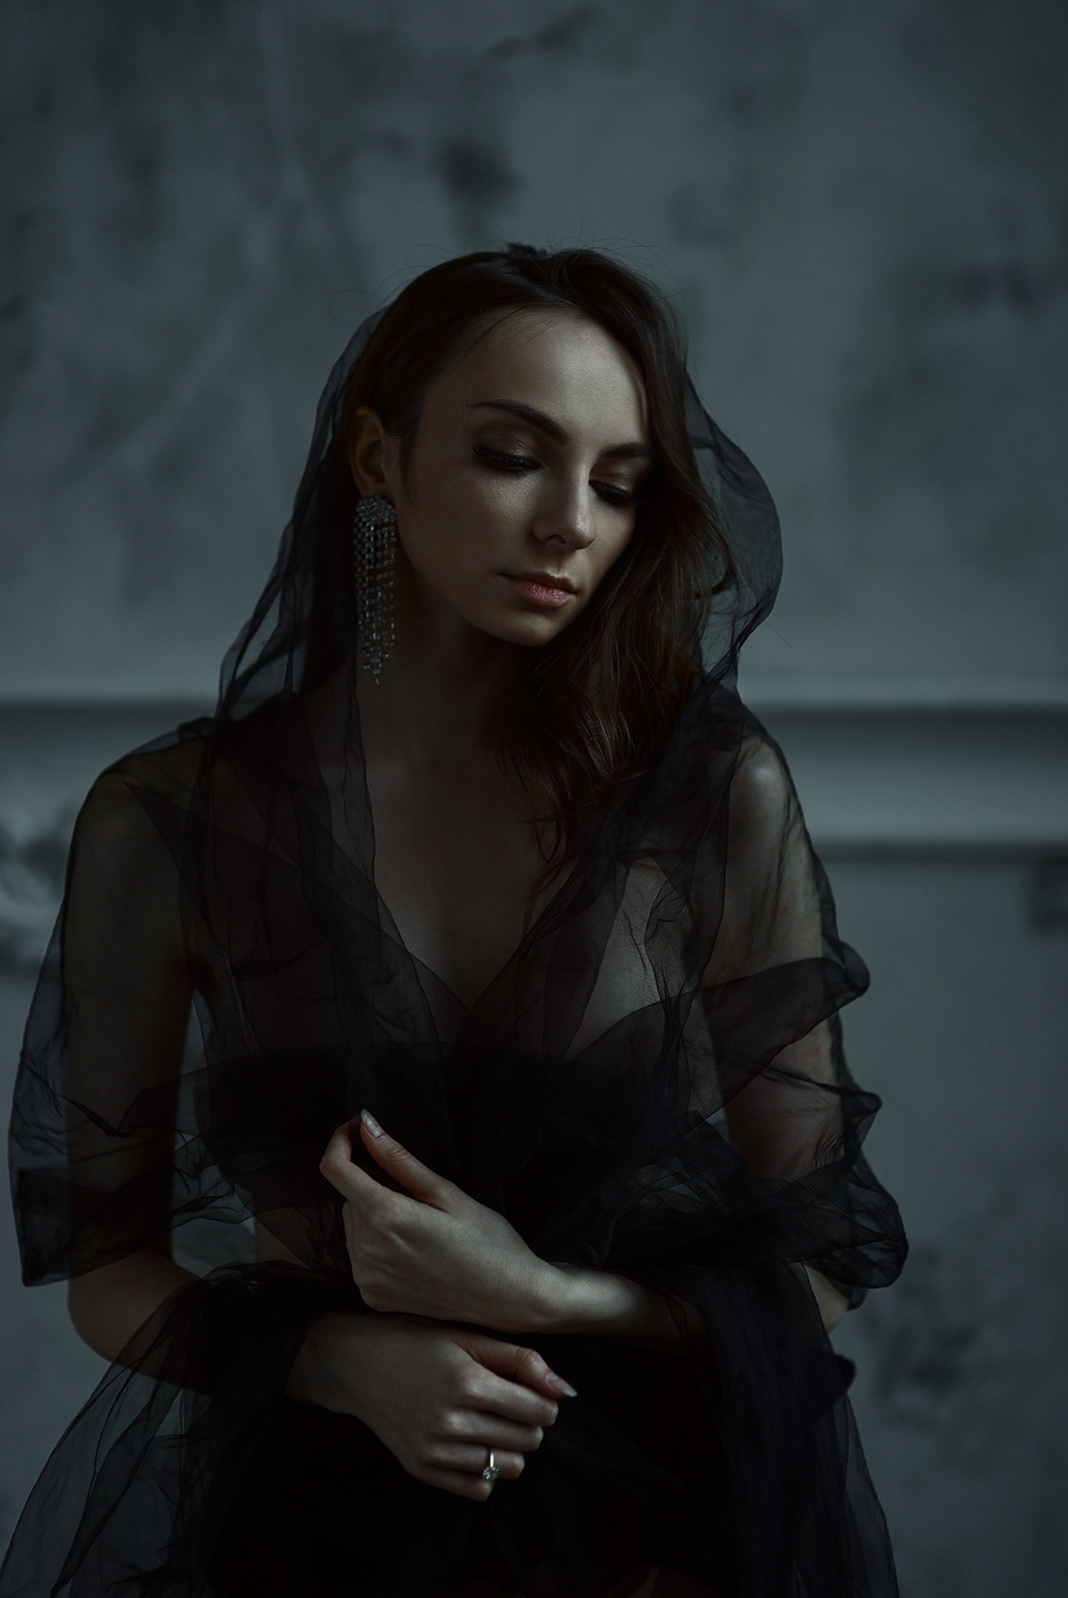 Model Margo Amp | Photographer Bugaenko Dmitry